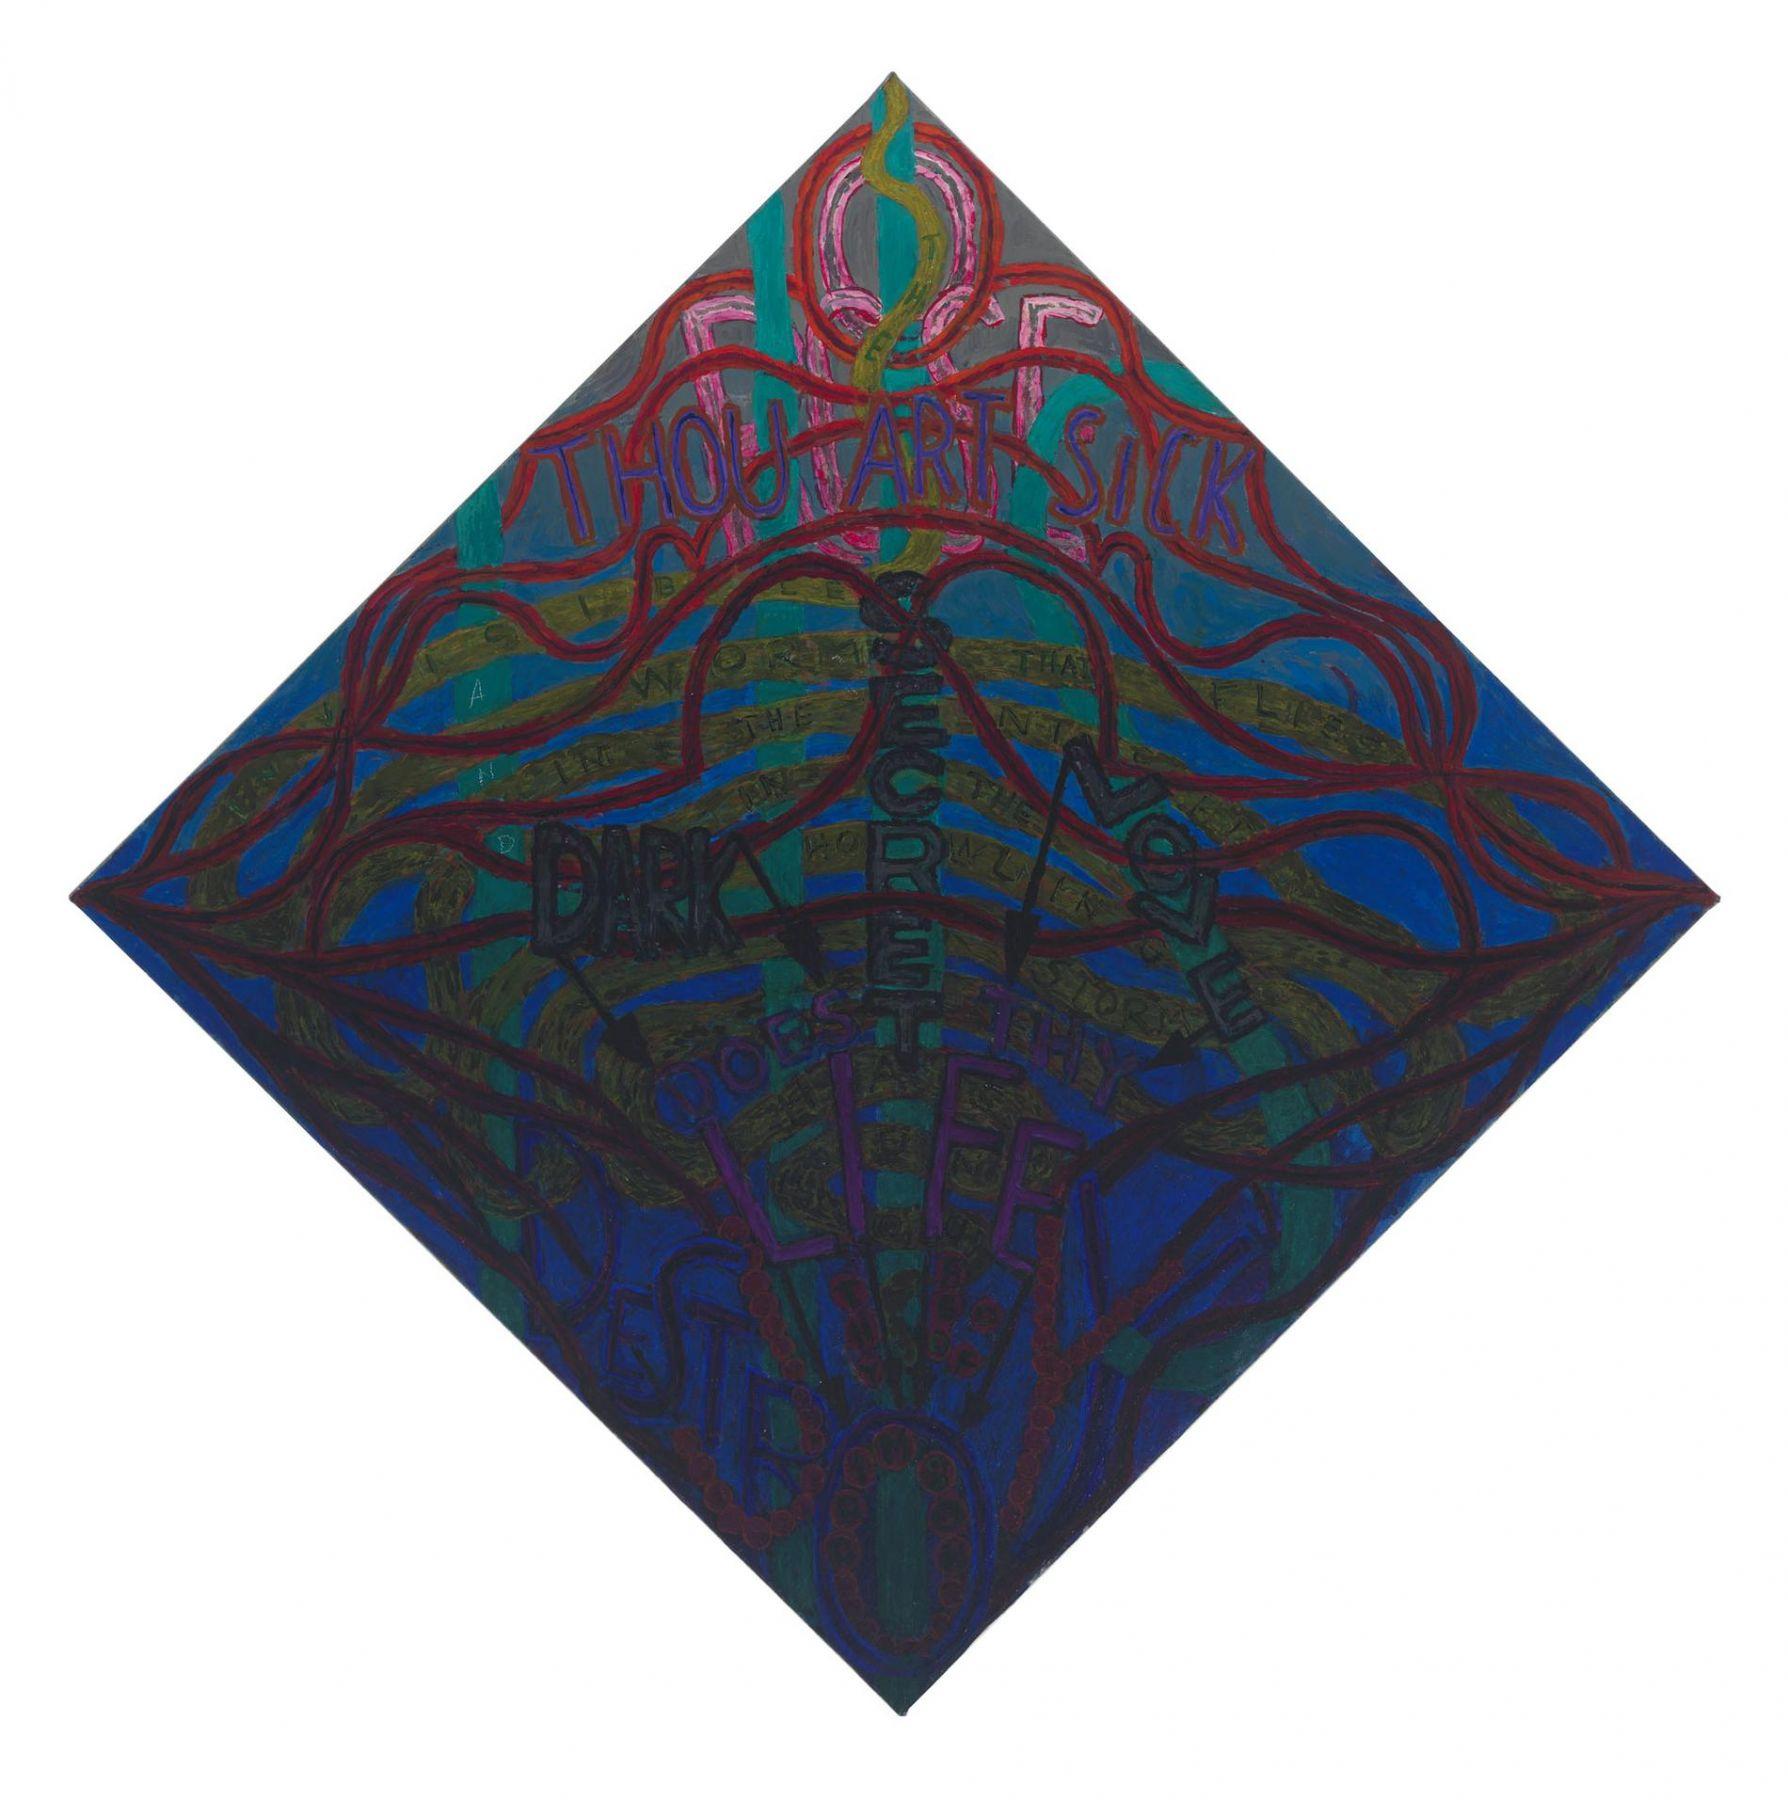 , PHILIP HANSON,O Rose thou art sick (Blake), 2014, oil on canvas, 25 1/4 x 25 1/4 in., 64.1 x 64.1 cm